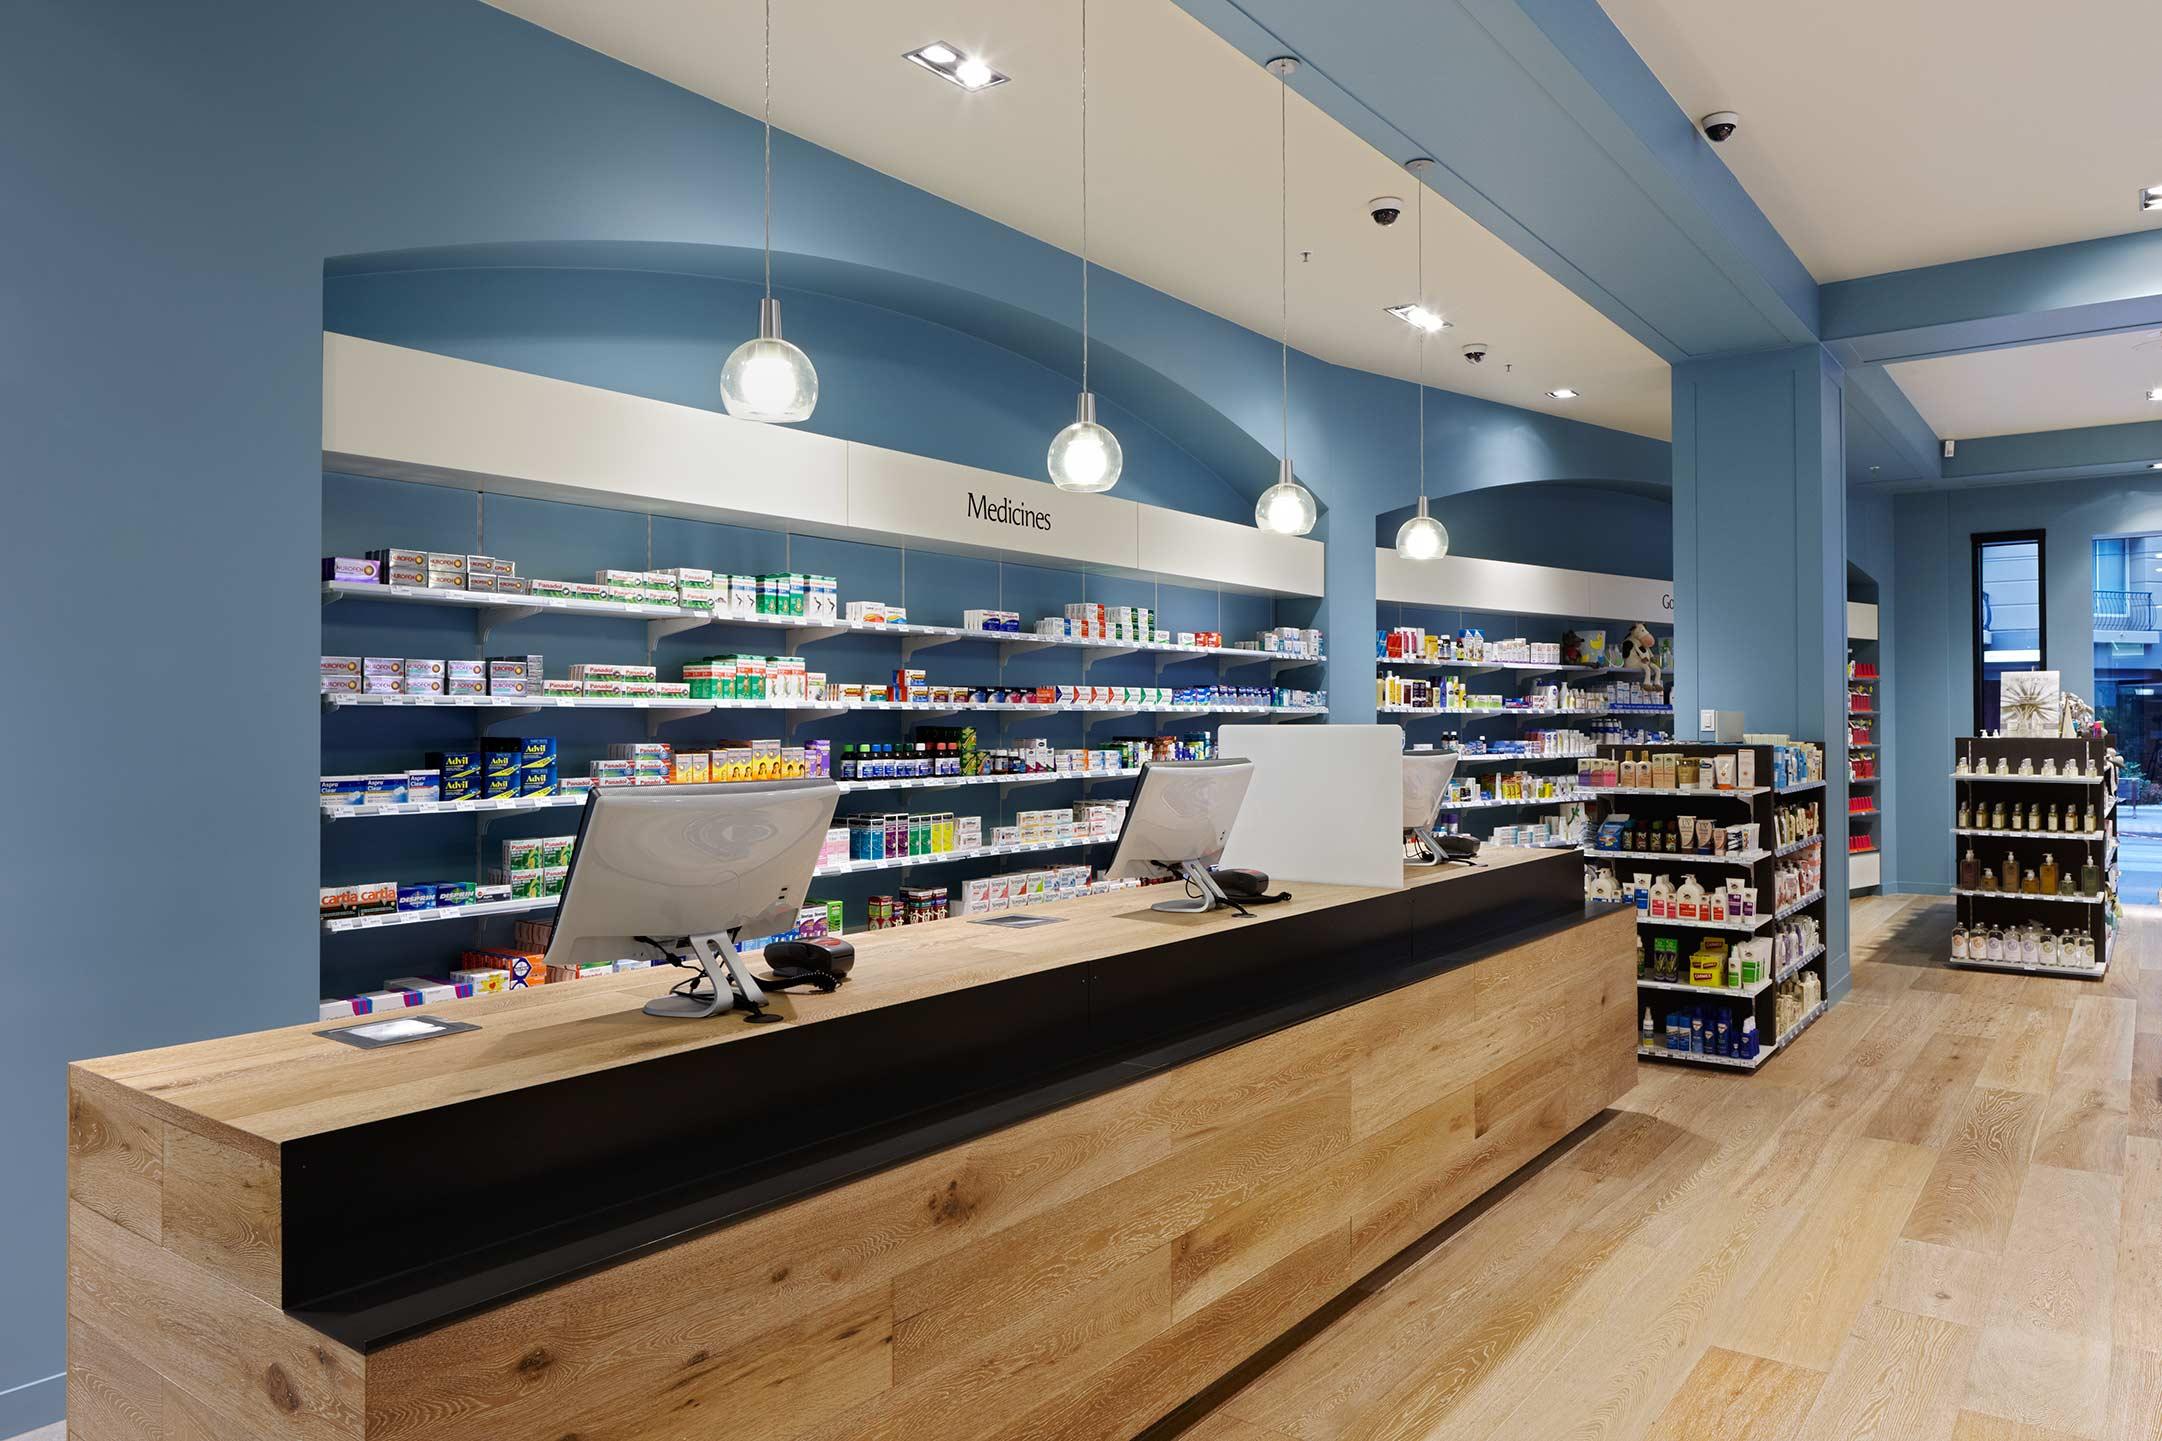 Beautiful Pharmacy Design Ideas Gallery - Home Design Ideas - getradi.us